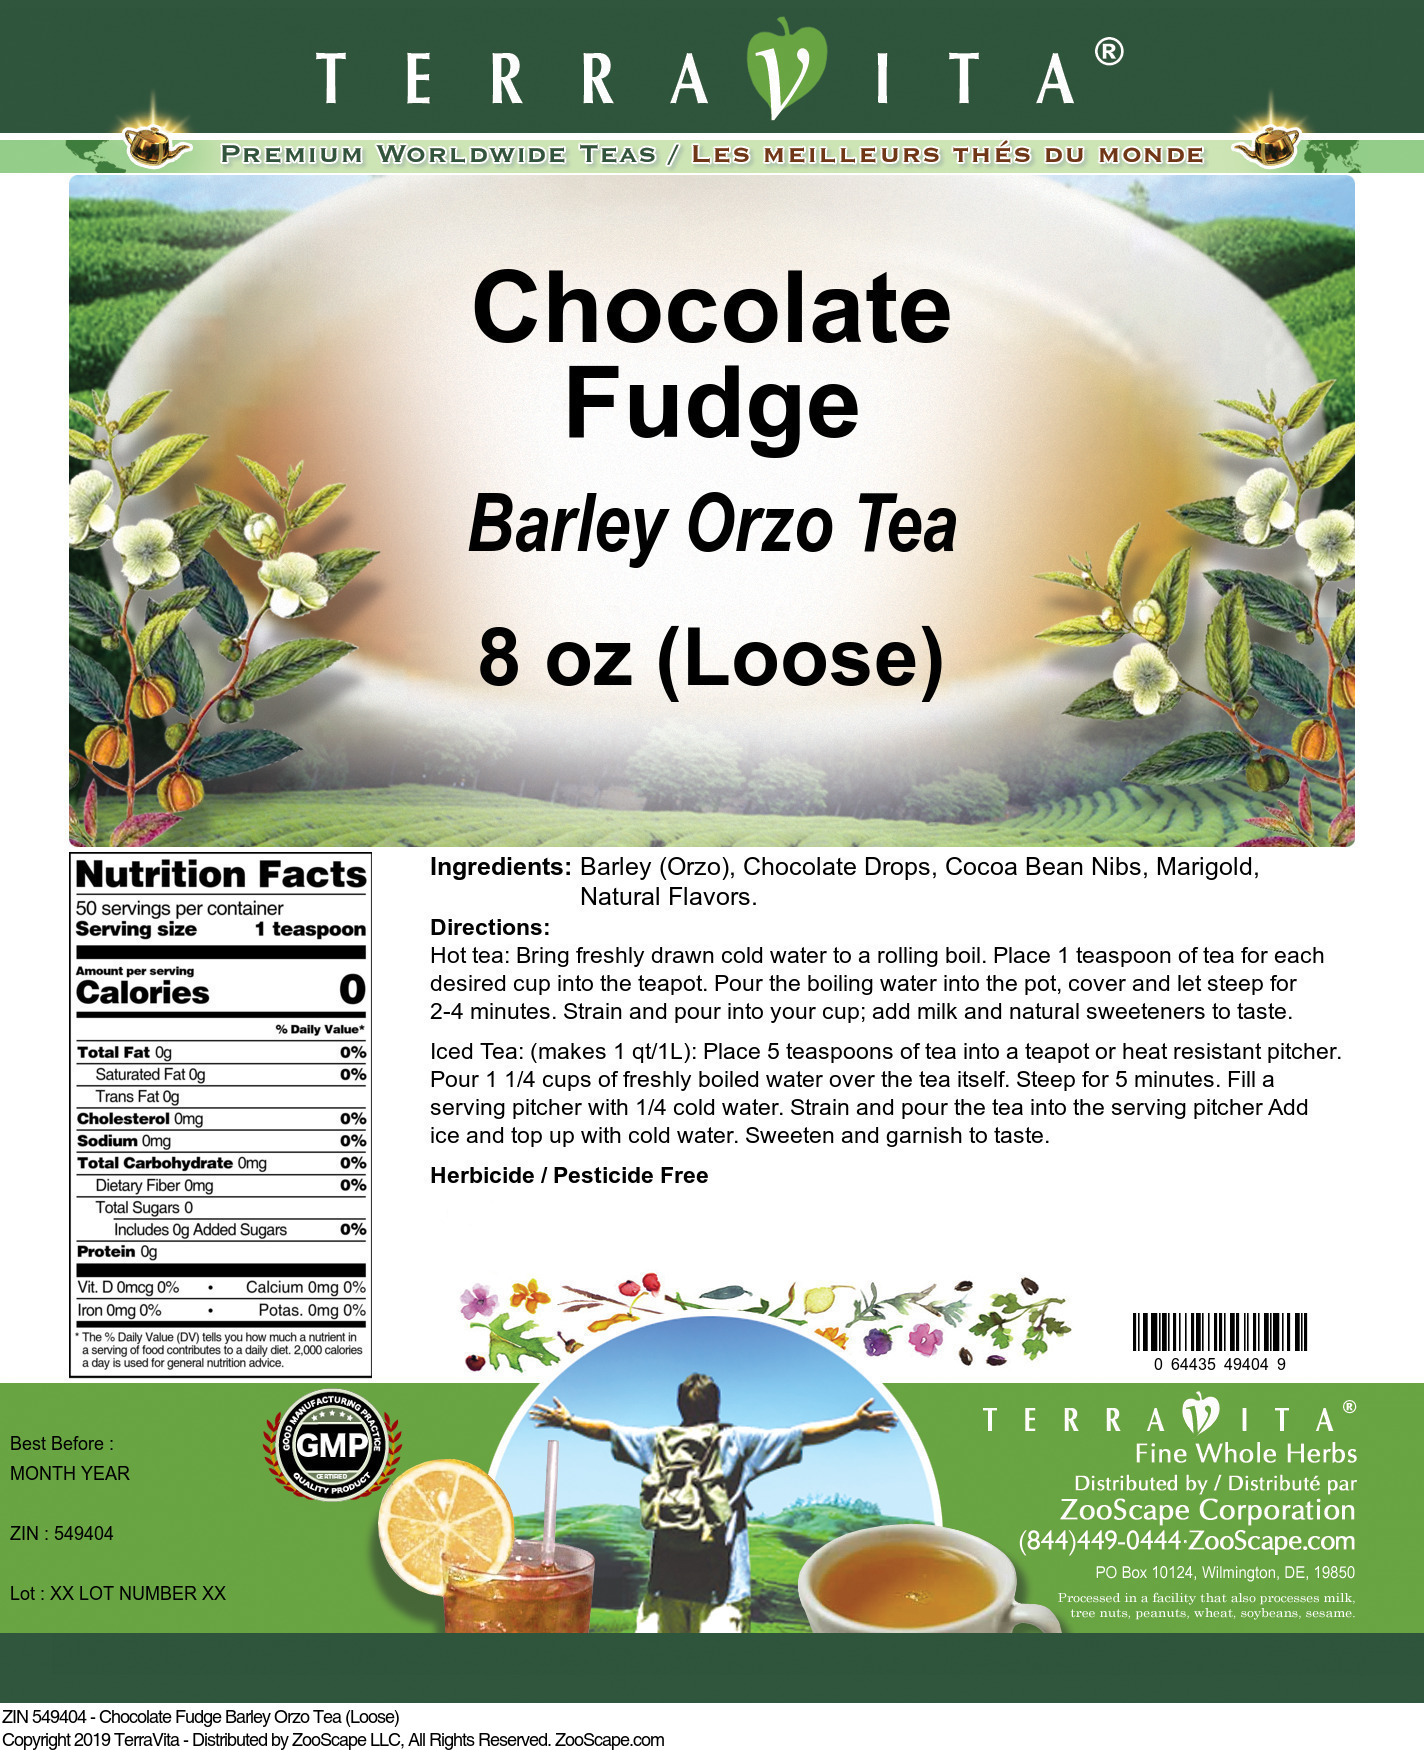 Chocolate Fudge Barley Orzo Tea (Loose)